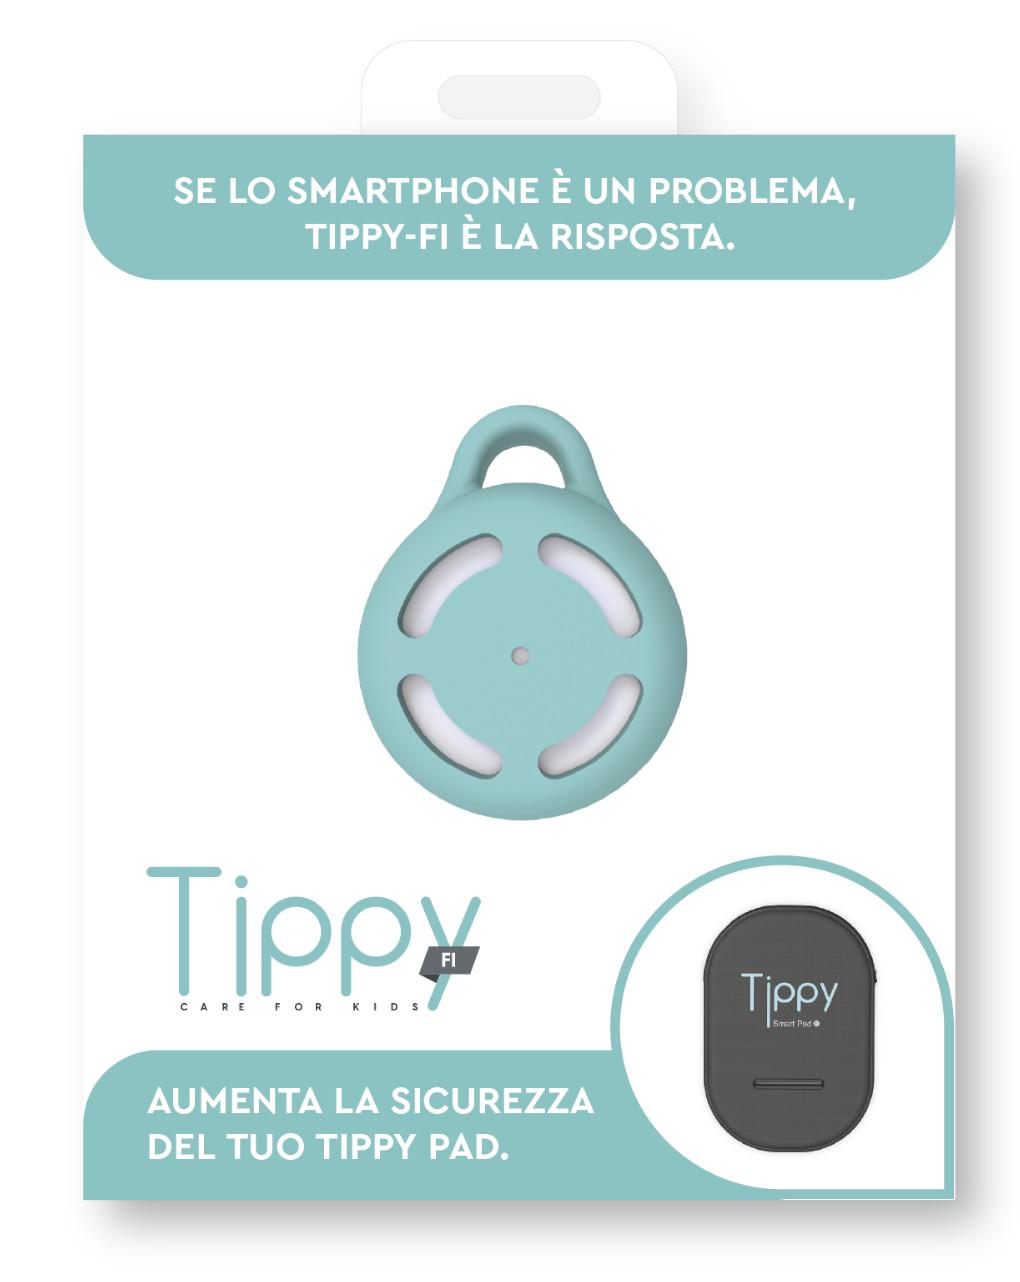 Dispositivo anti-abbandono tippy-fi - Tippy